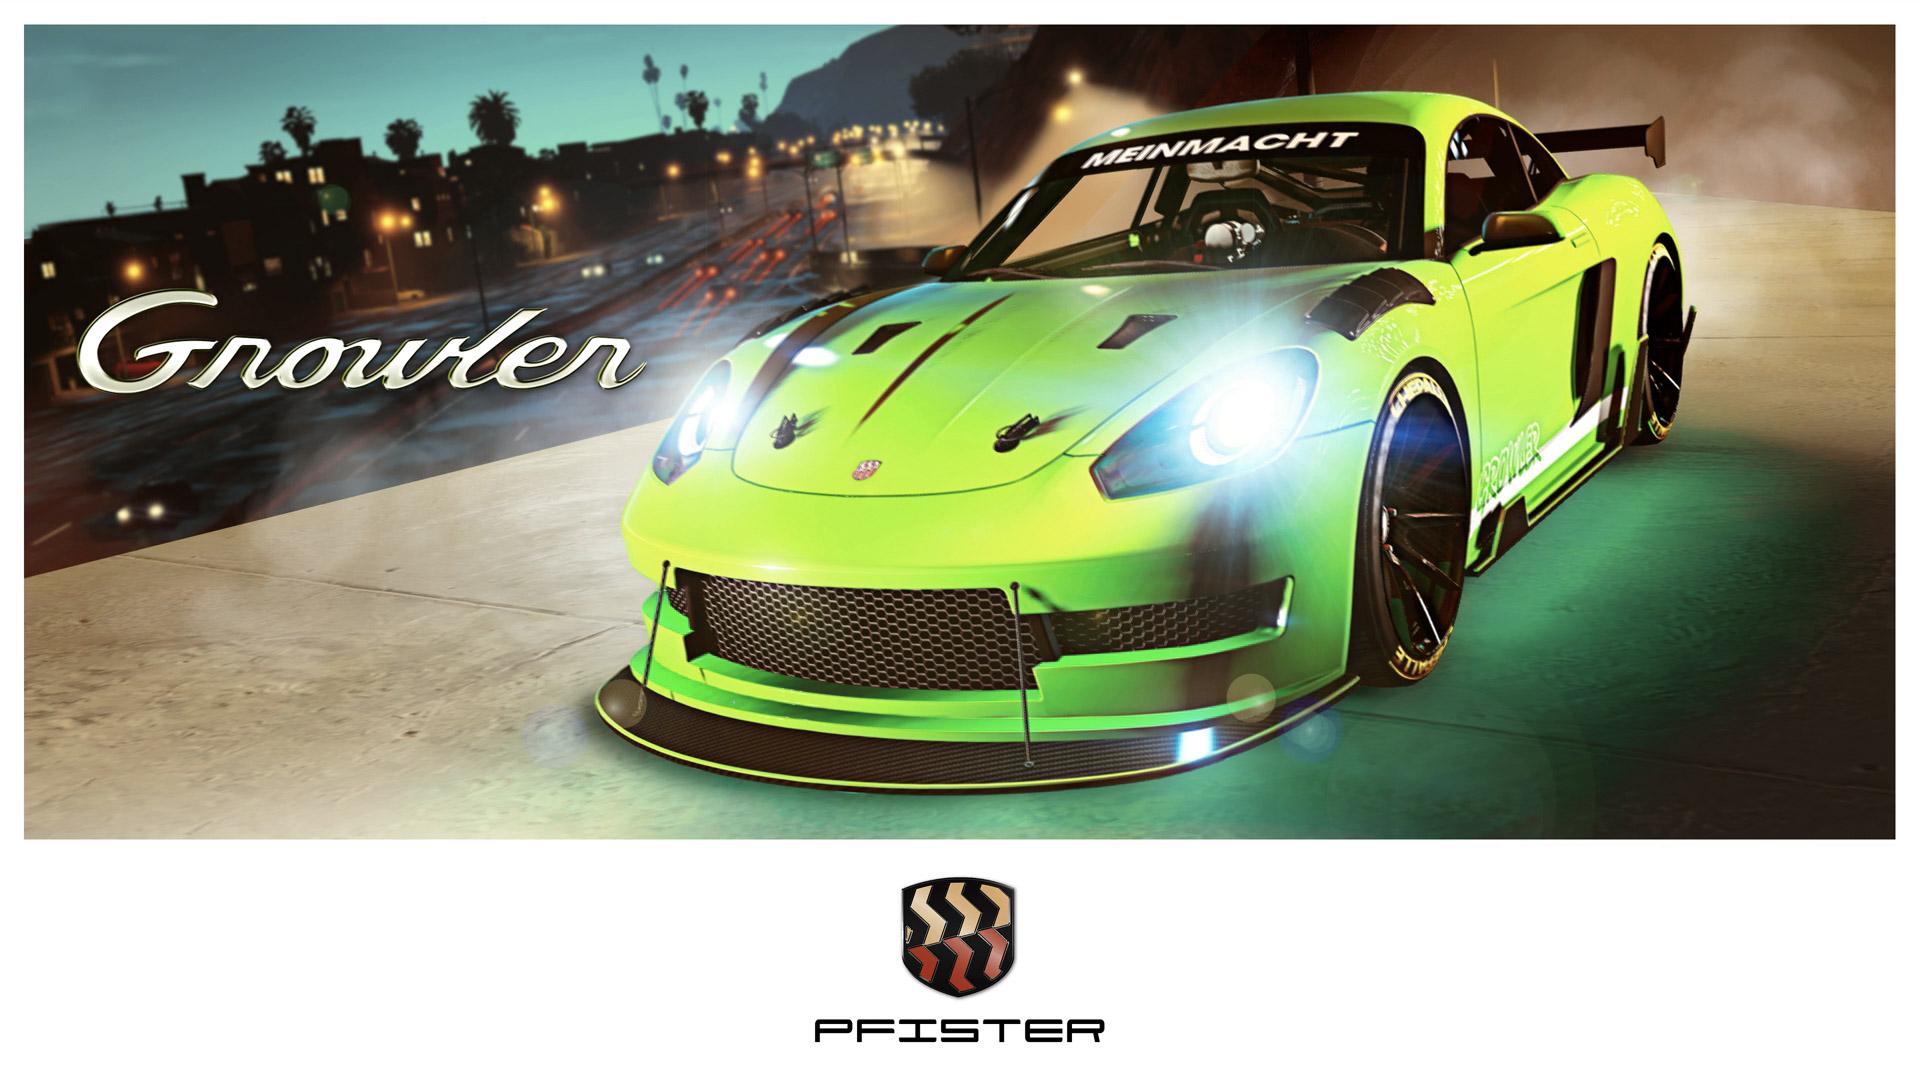 GTA Online Los Santos Tuners Pfister Growler